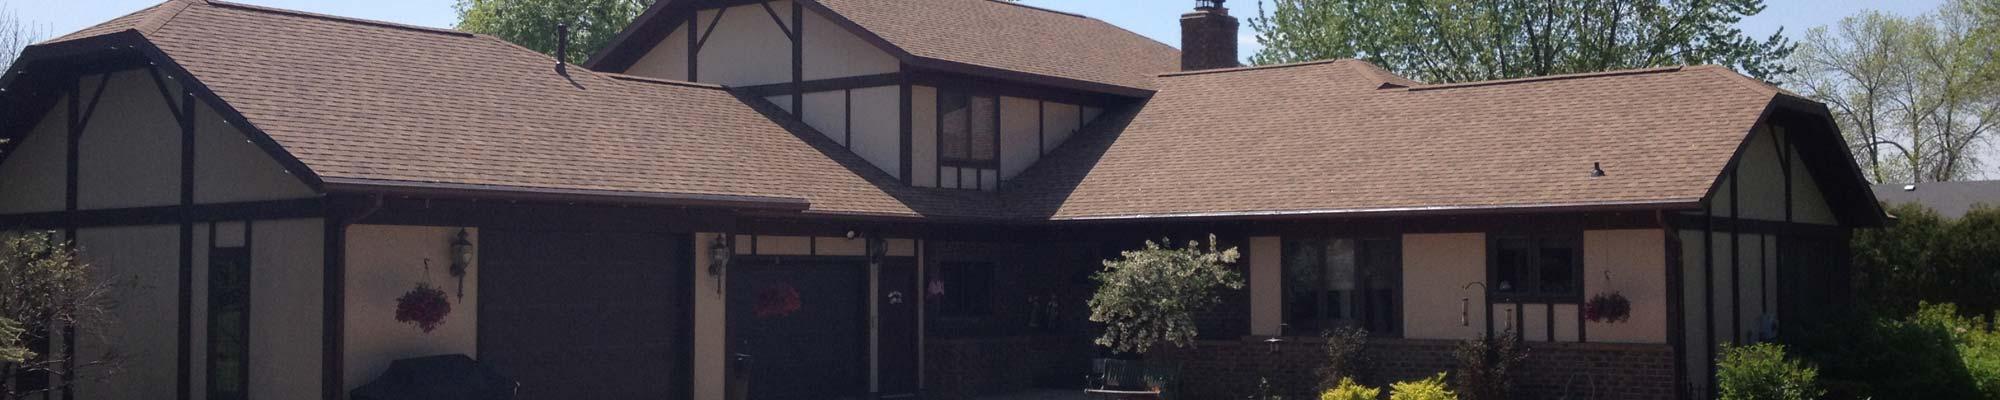 Roof Repairs in Stevens Point, WI